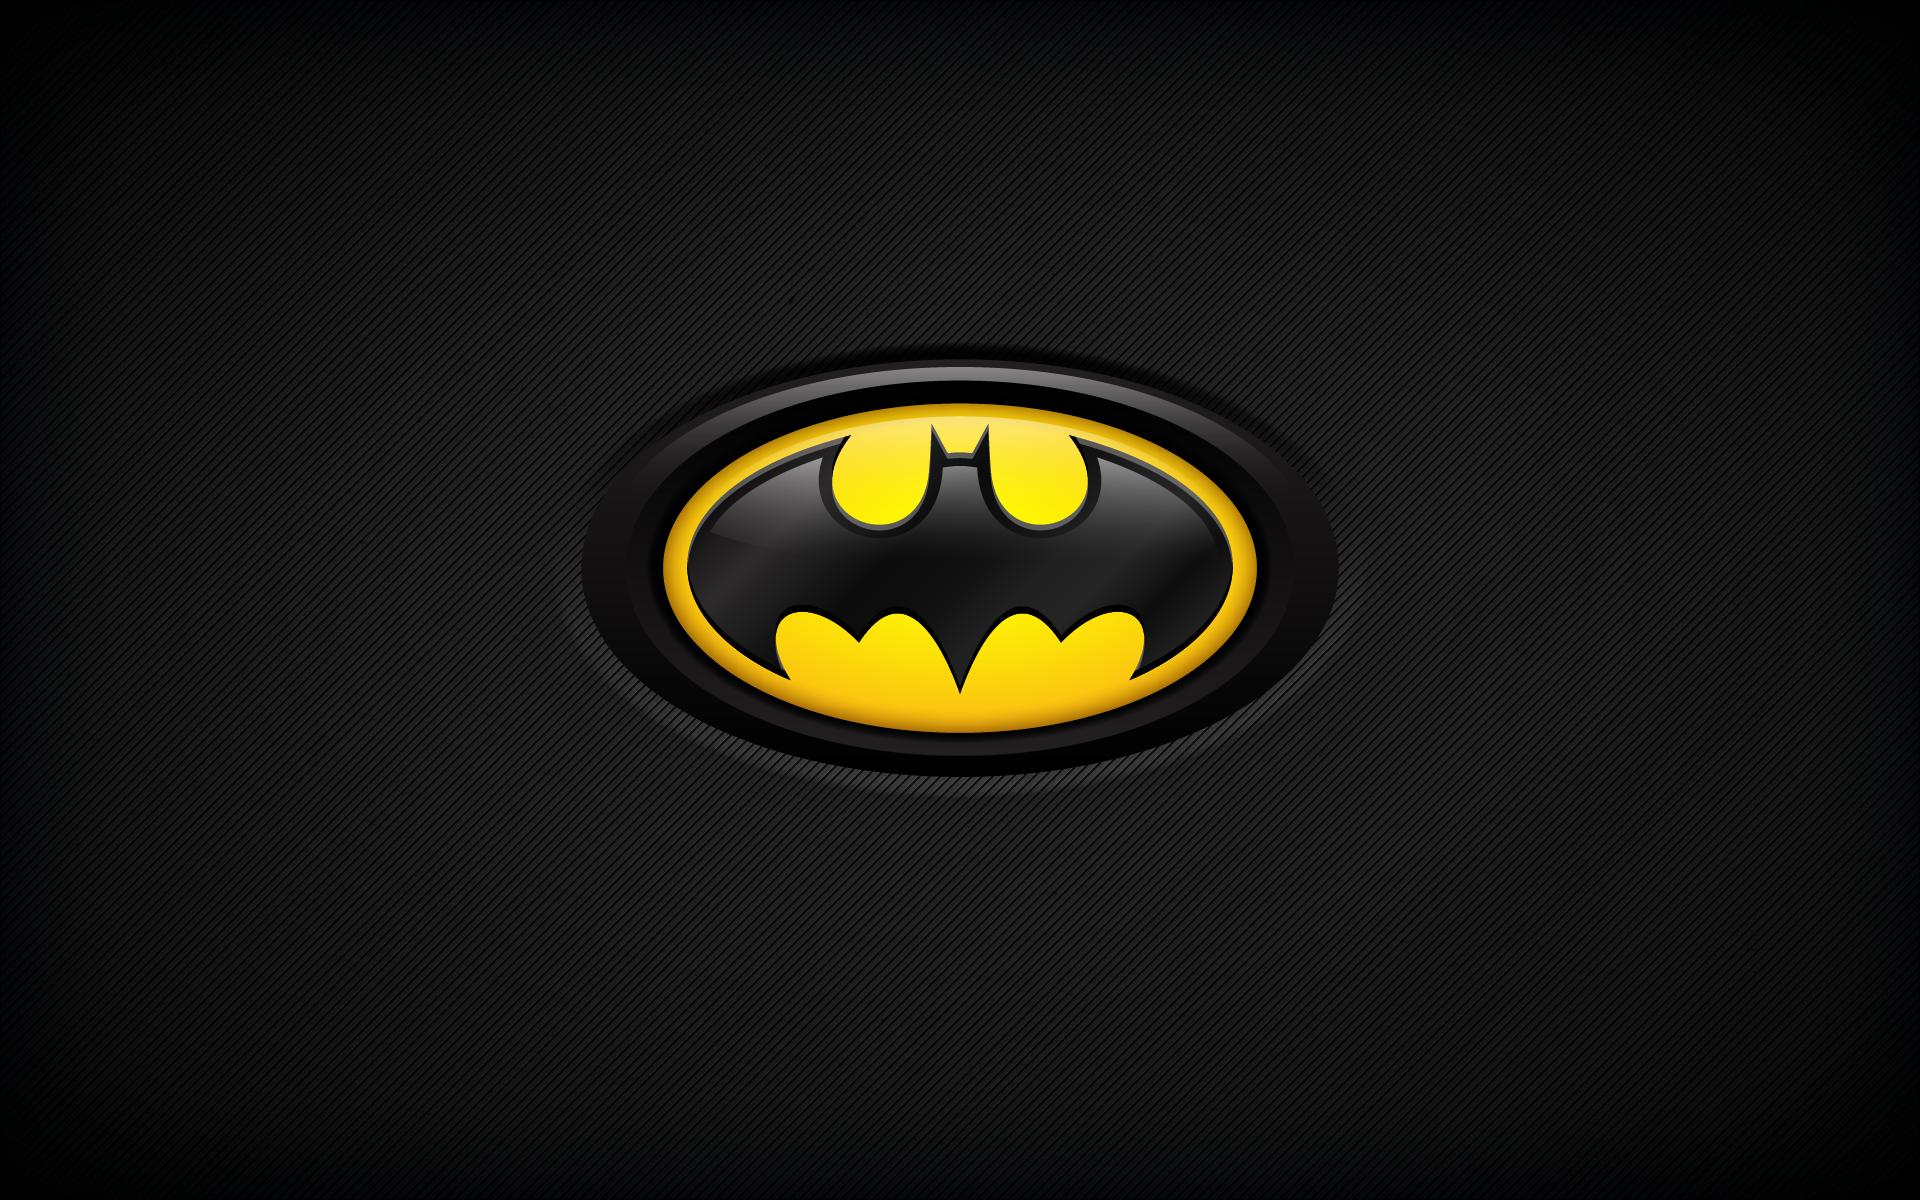 Batman Dark Background Logo Nokia 230 215 Samsung Xcover 550 LG G350 Android